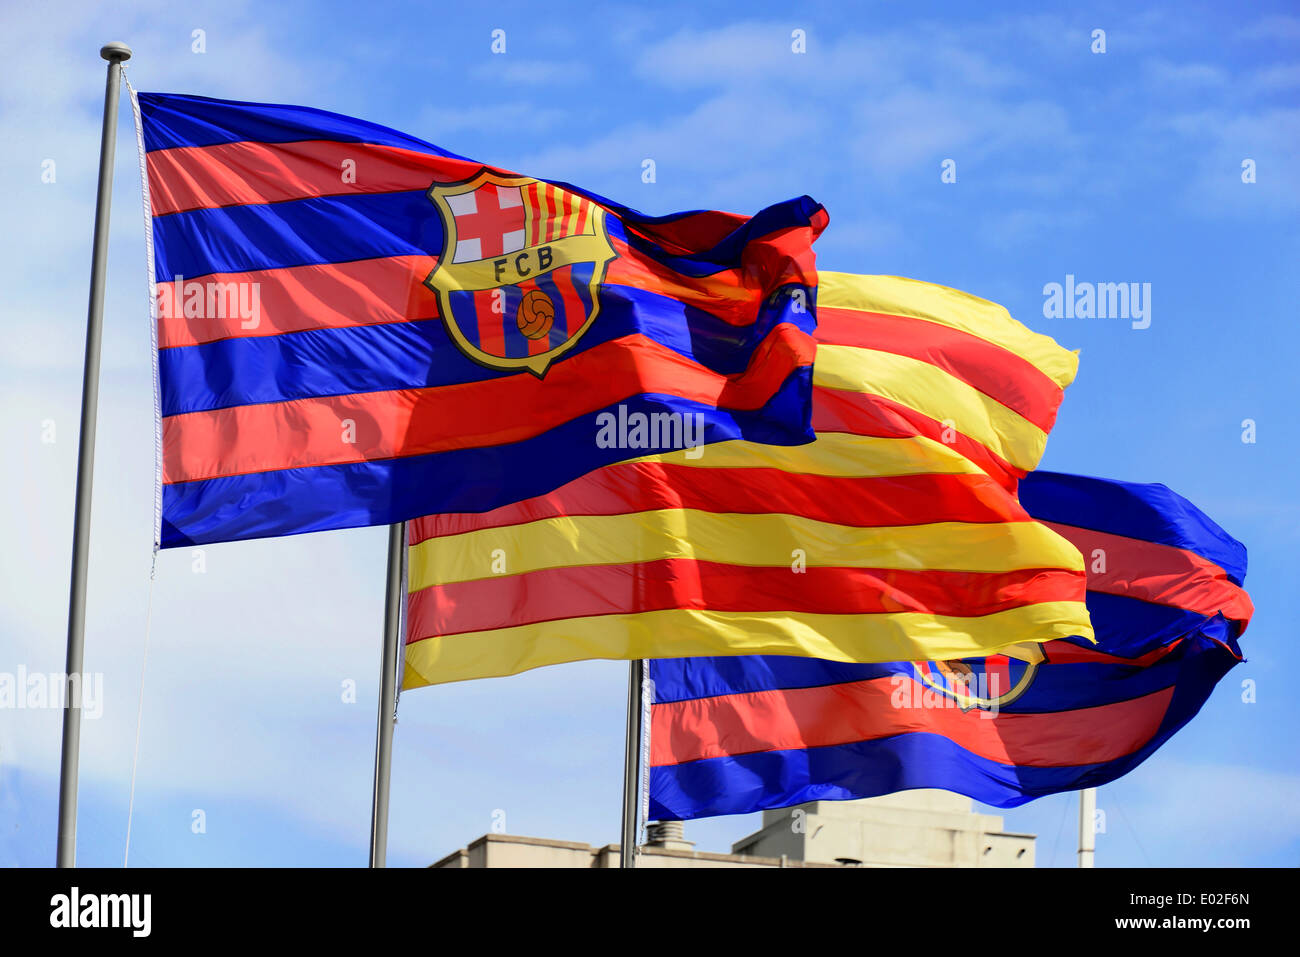 FC Barcelona flags at the Camp Nou Stadium, Barcelona, Catalonia, Spain - Stock Image